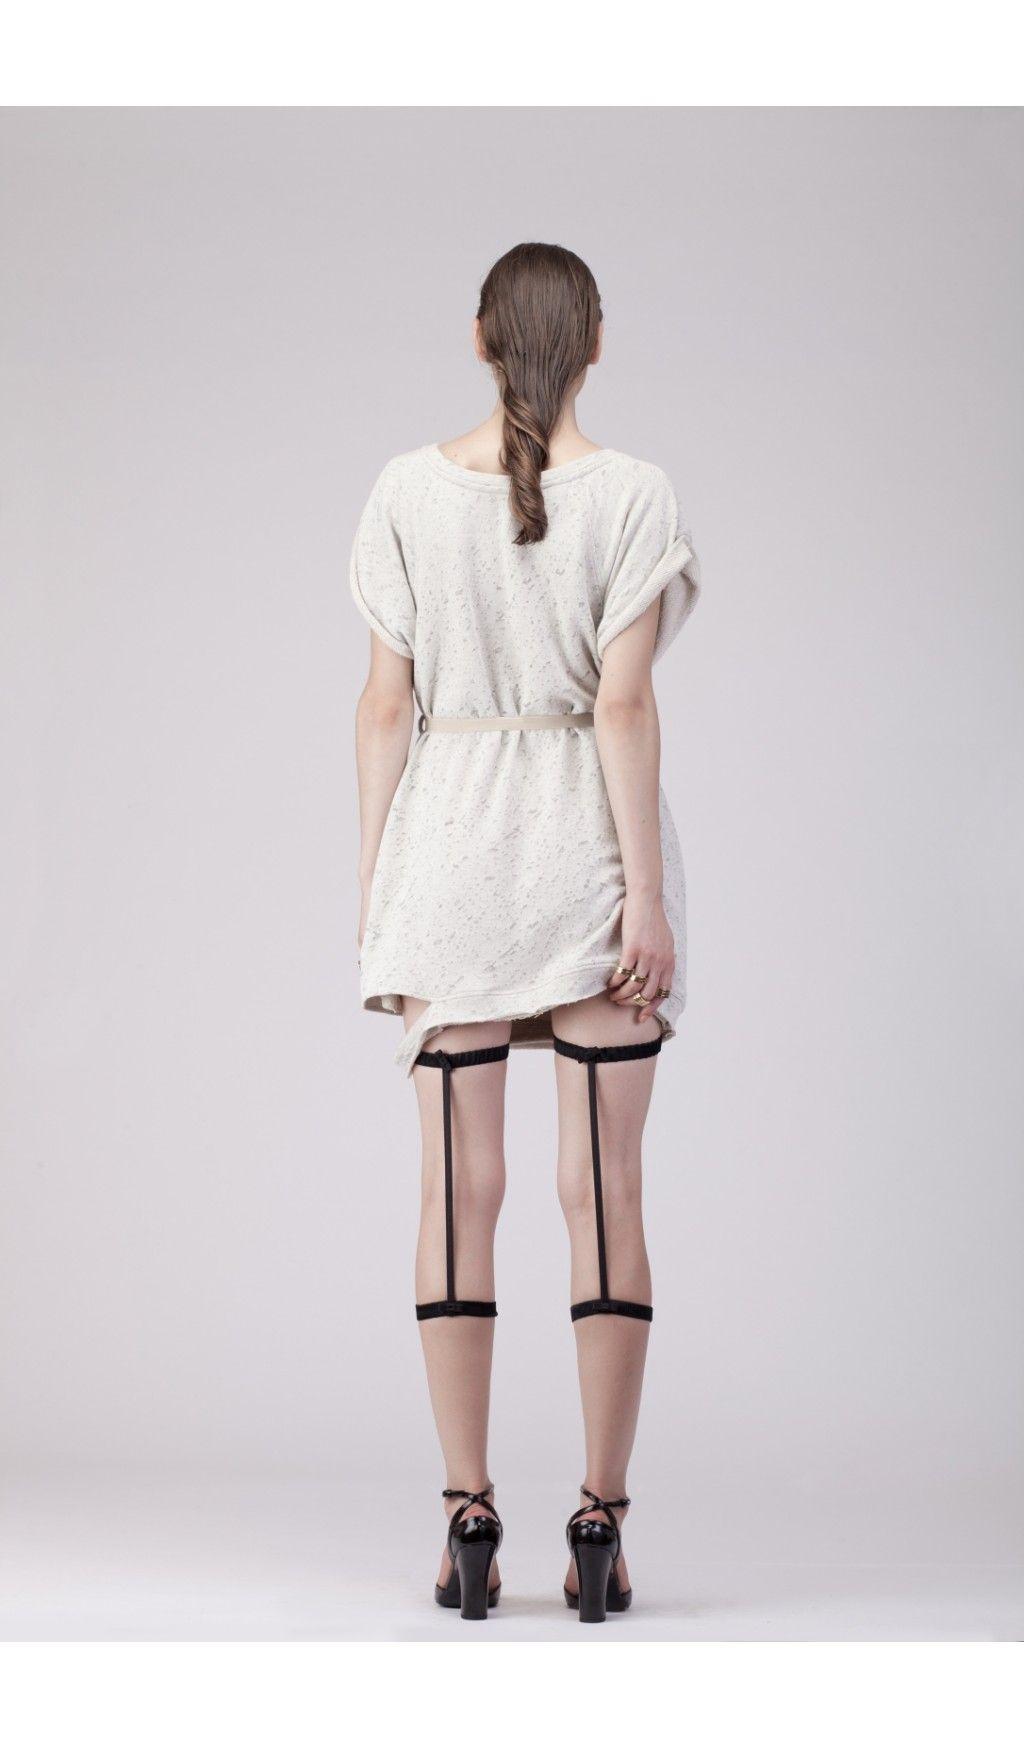 P.O. Dress - Wijde sweater jurk